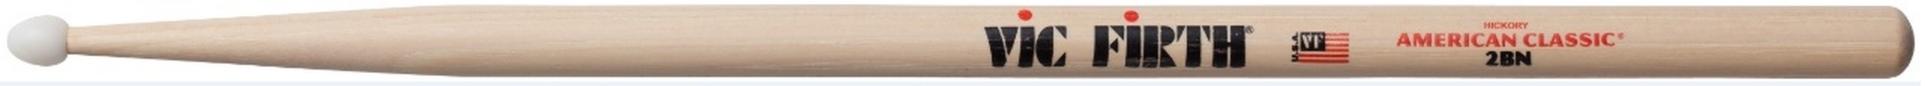 American Classic 2B Drum Sticks Nylon Tip: Drumsticks